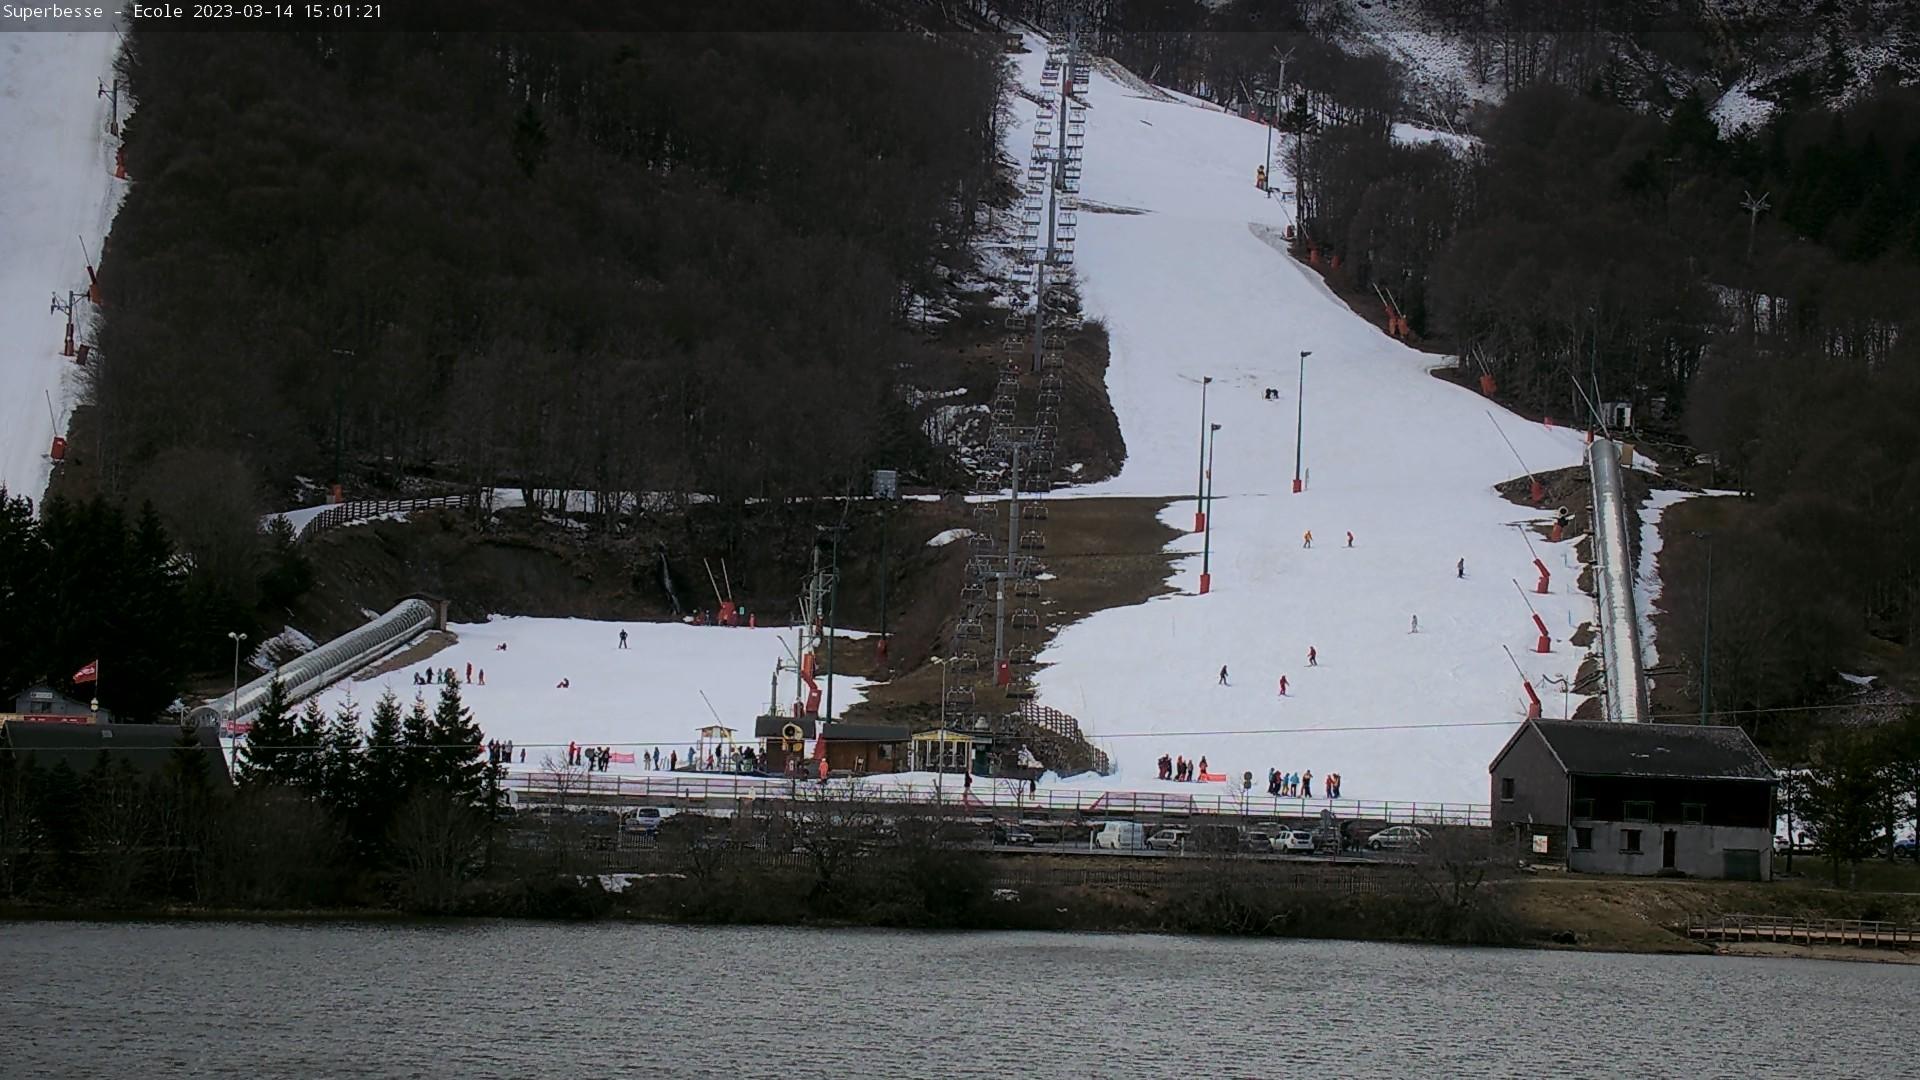 webcam Besse - Super Besse